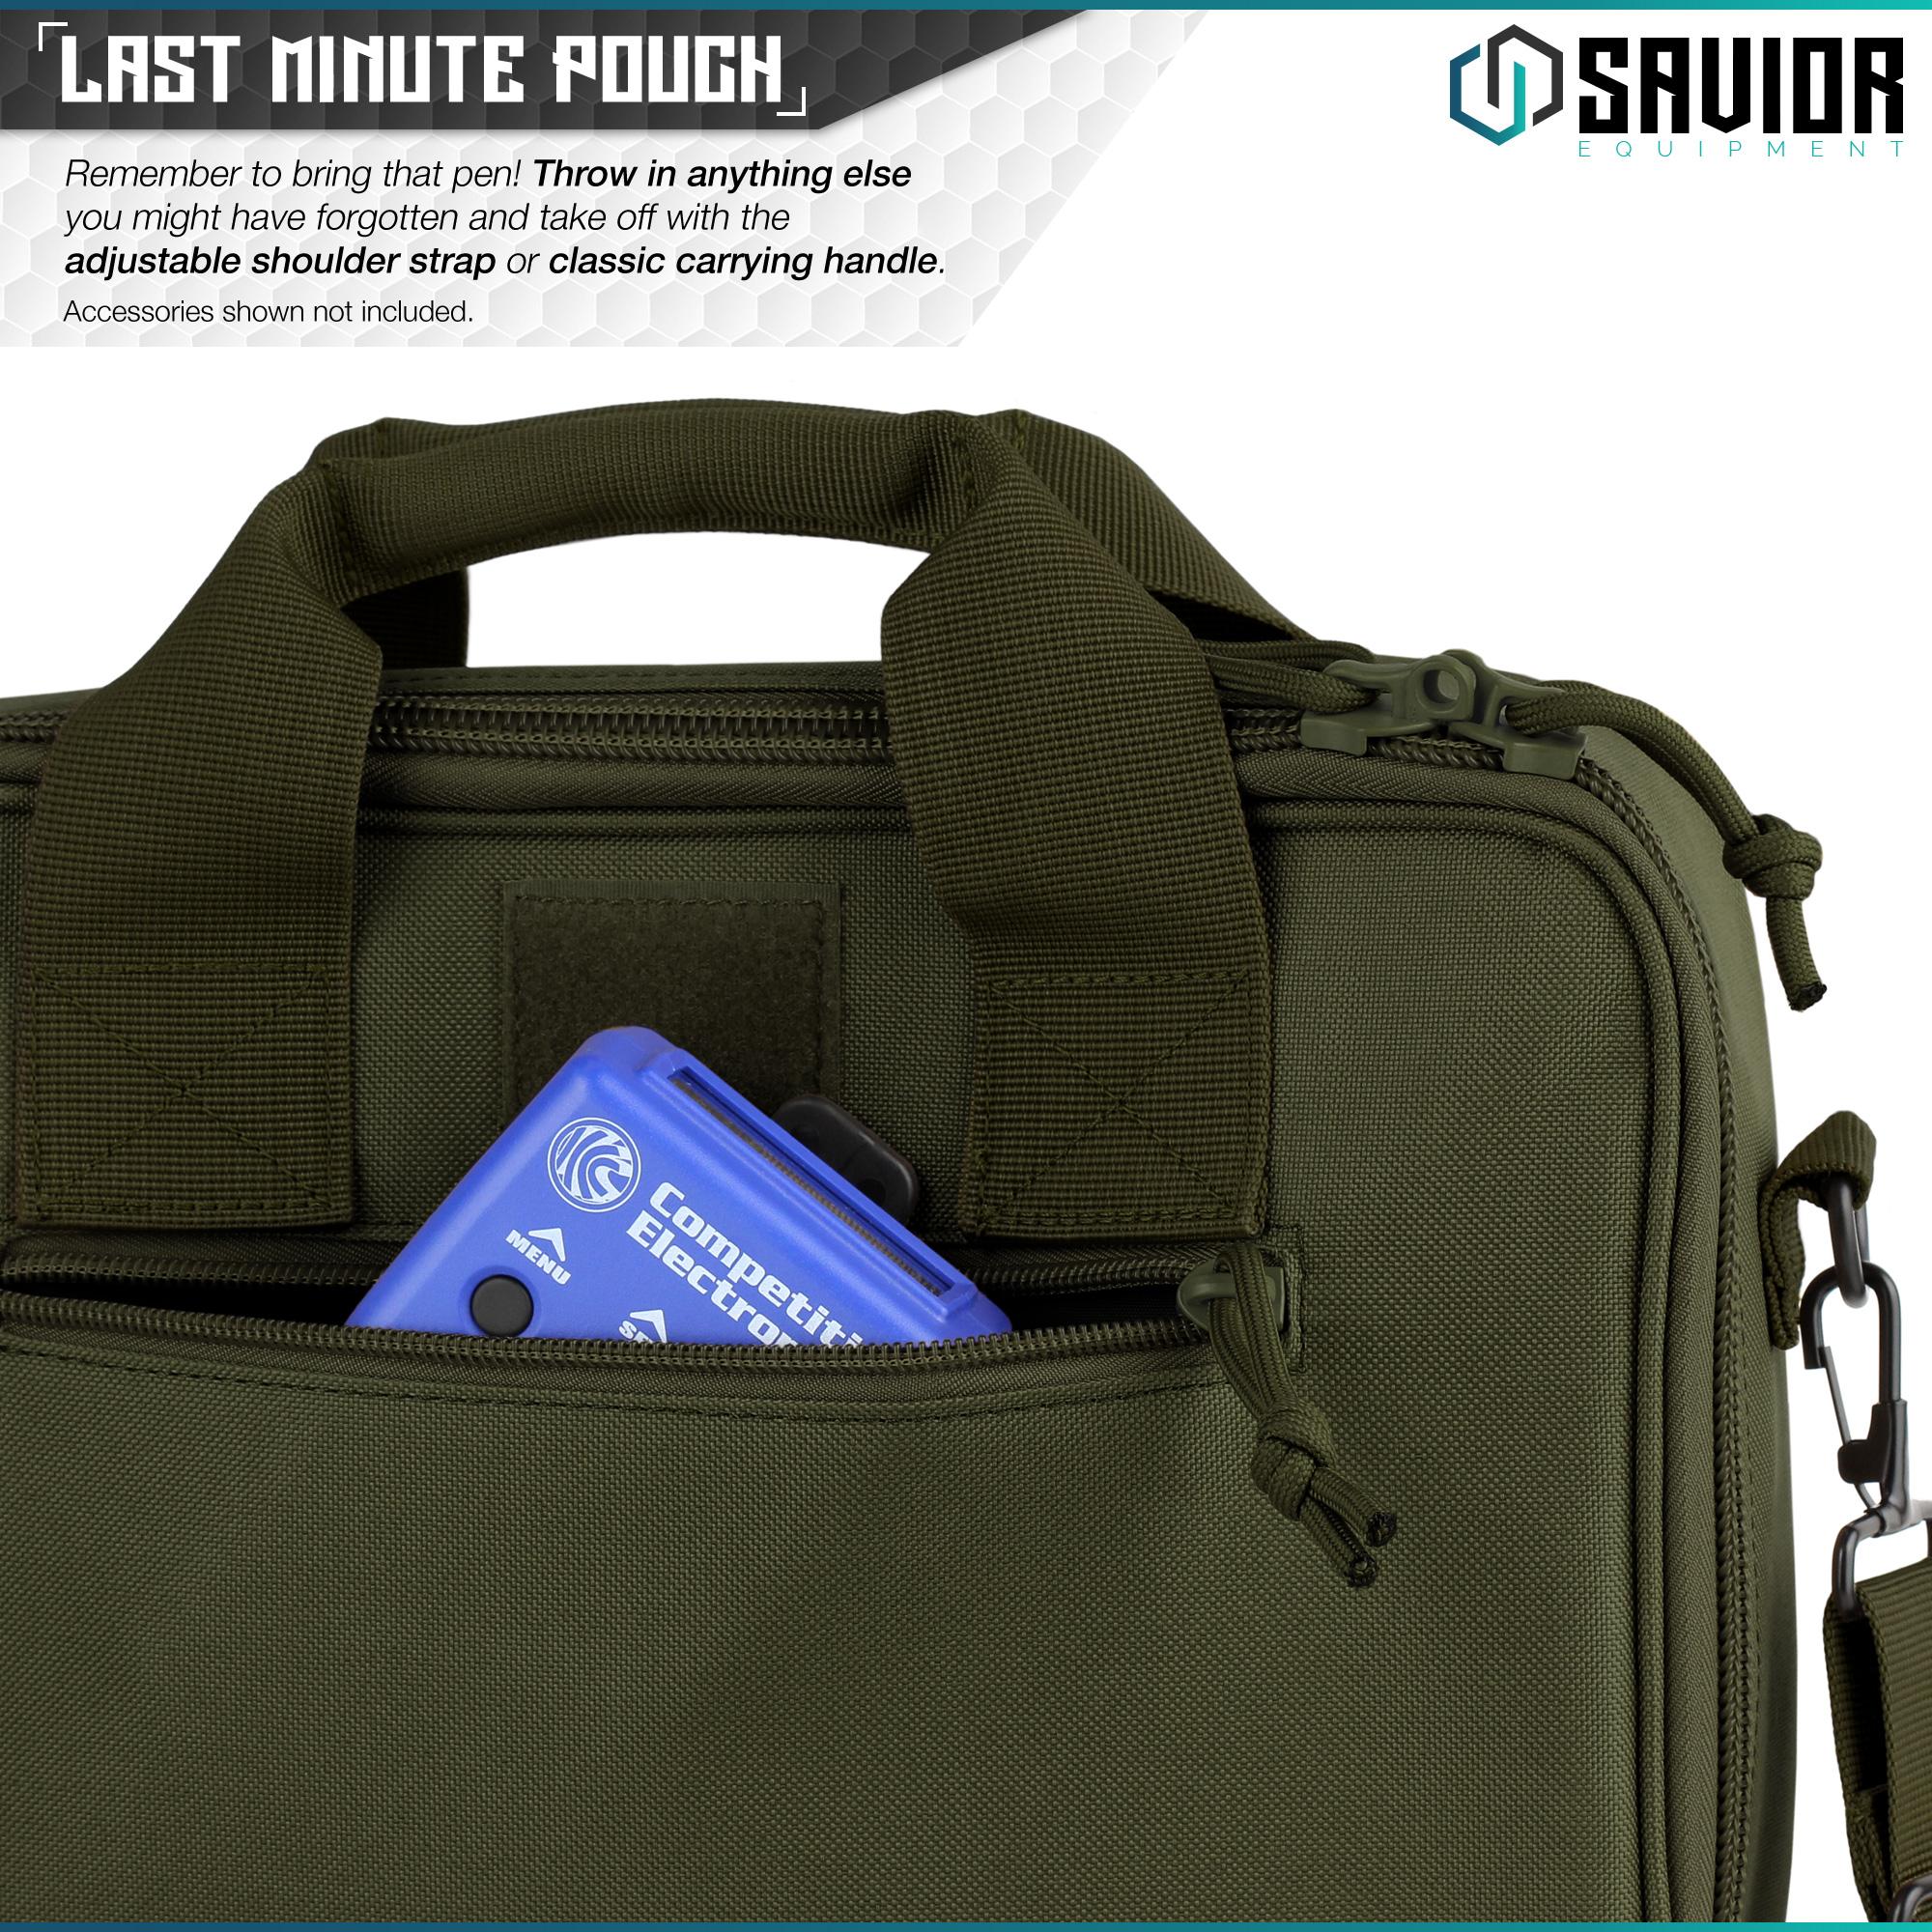 034-SAVIOR-034-Padded-Discreet-Double-Handgun-Bag-Pistol-Storage-Case-w-Mag-Pouch-Slot thumbnail 24